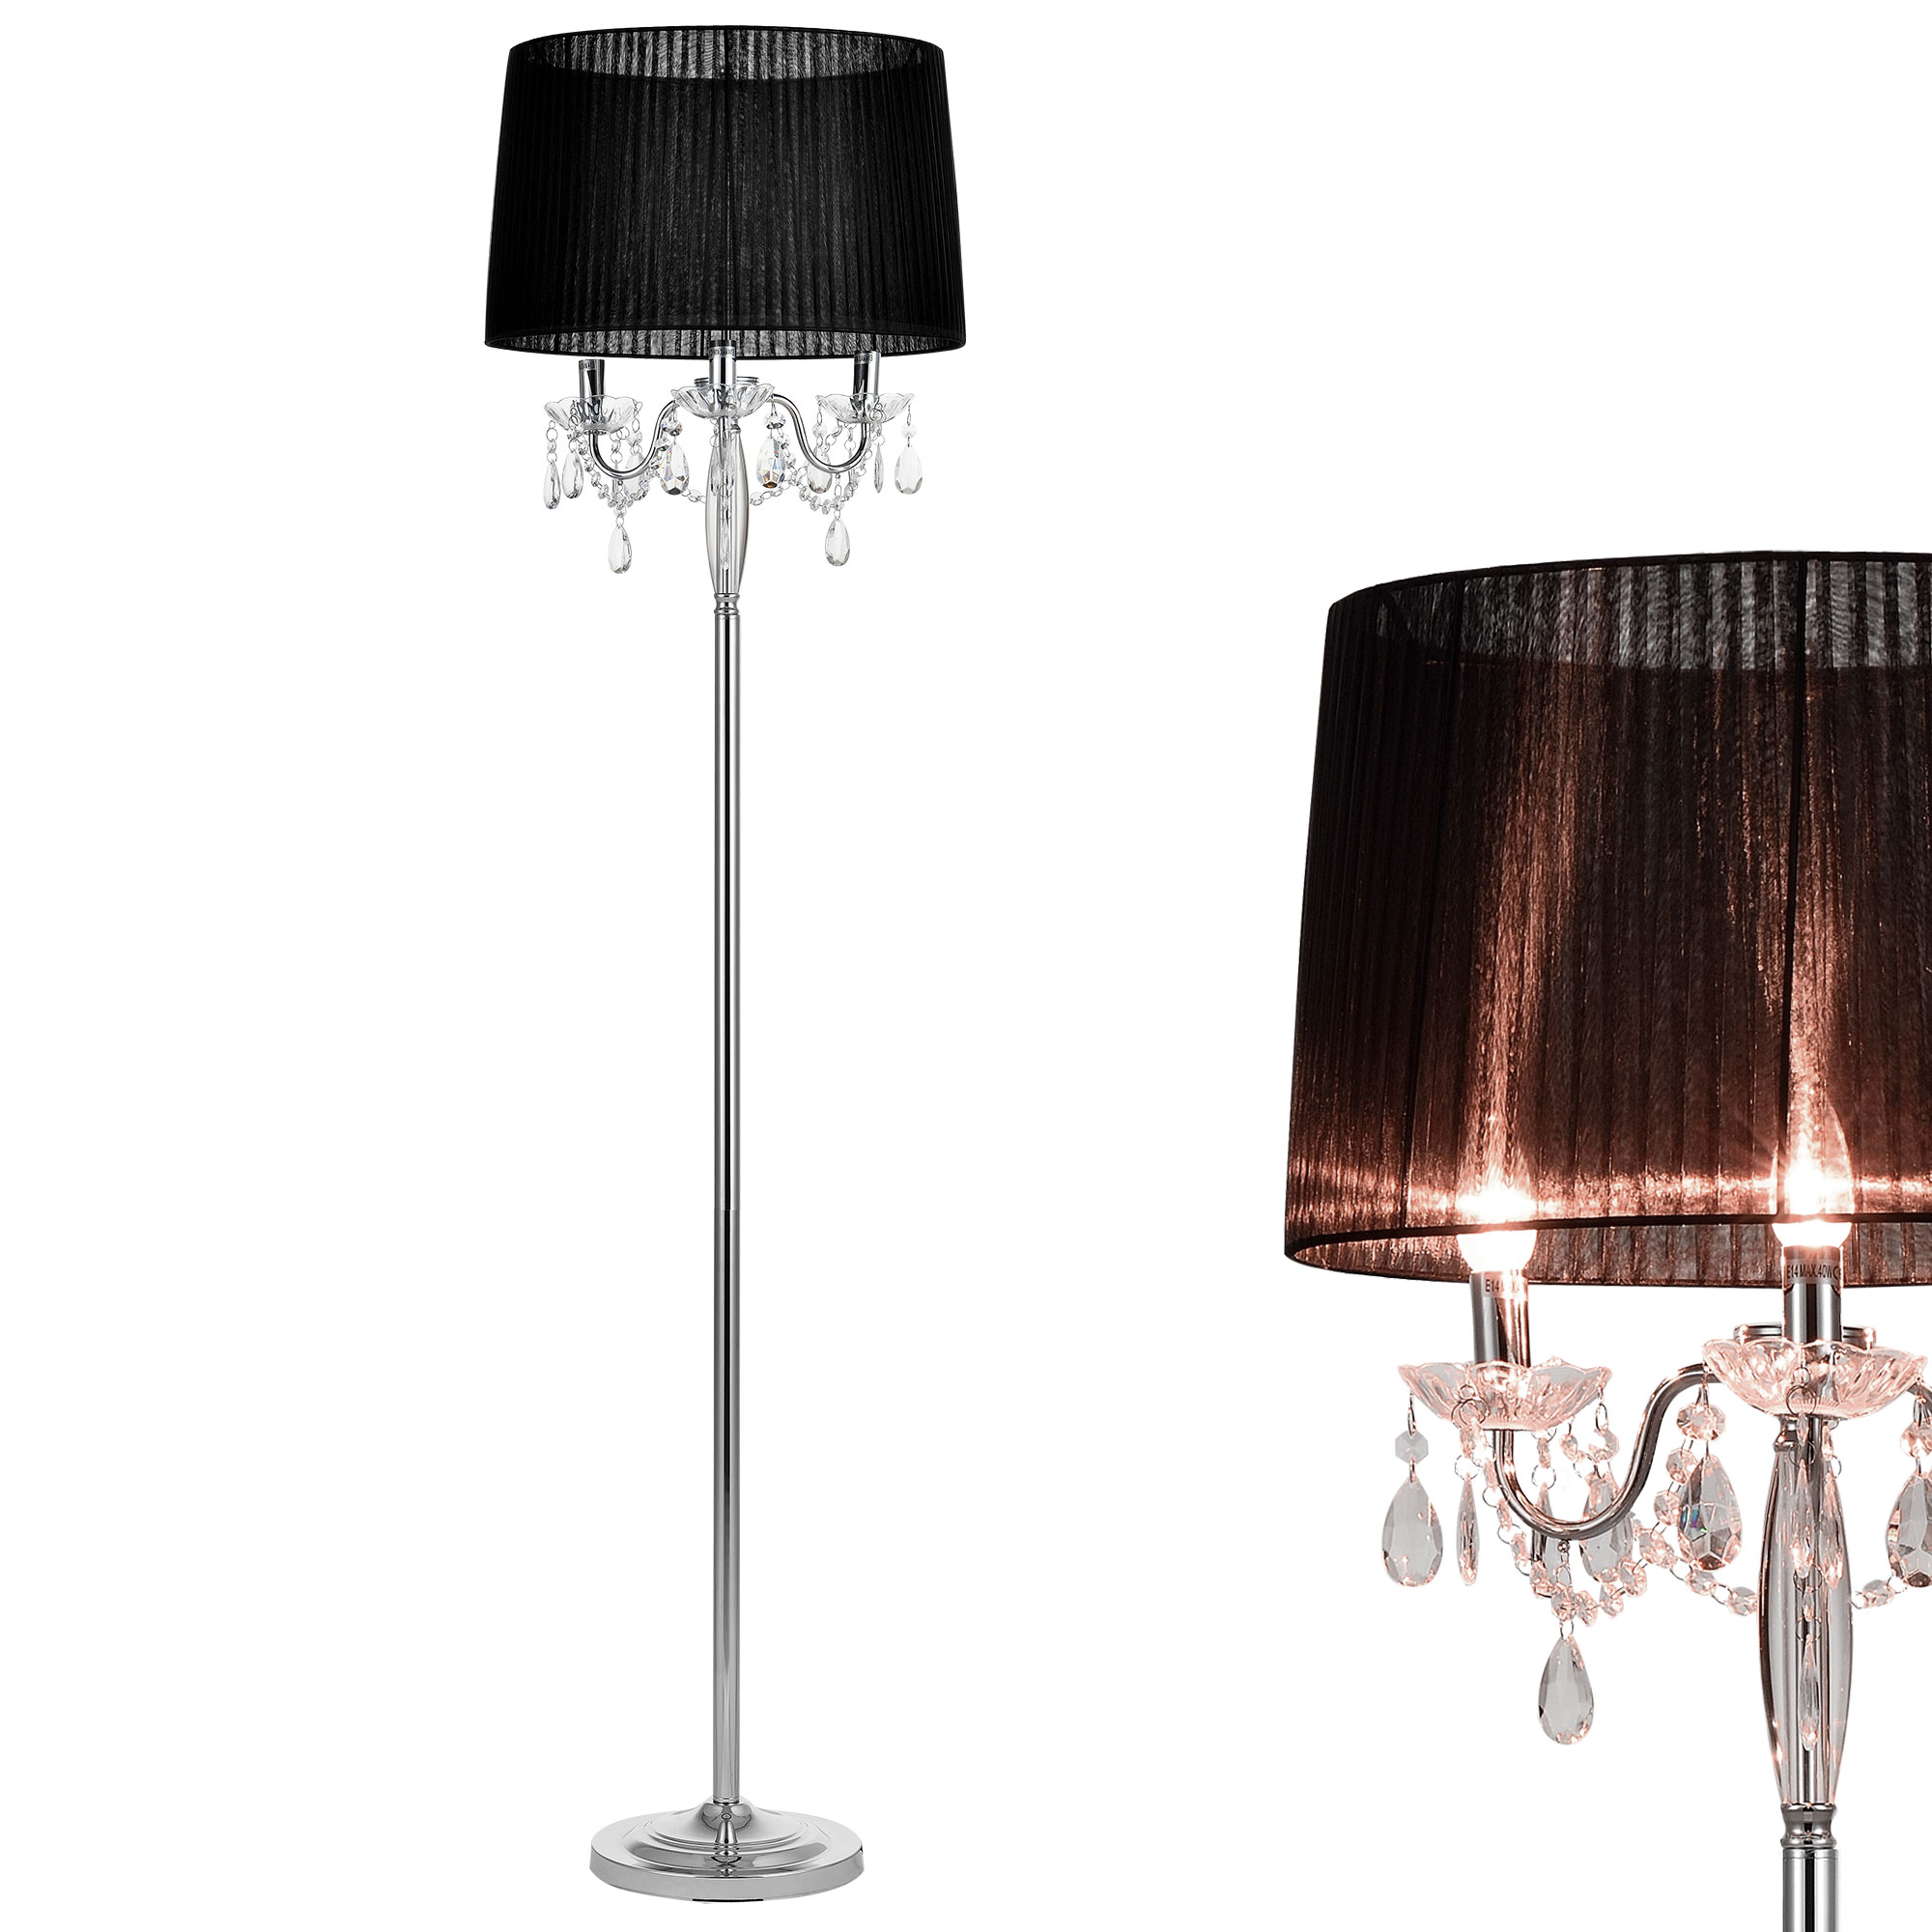 Full Size of Kristall Stehlampe Edel Stehleuchte Lampe Wohnzimmerlampe Leuchte Wohnzimmer Stehlampen Schlafzimmer Wohnzimmer Kristall Stehlampe